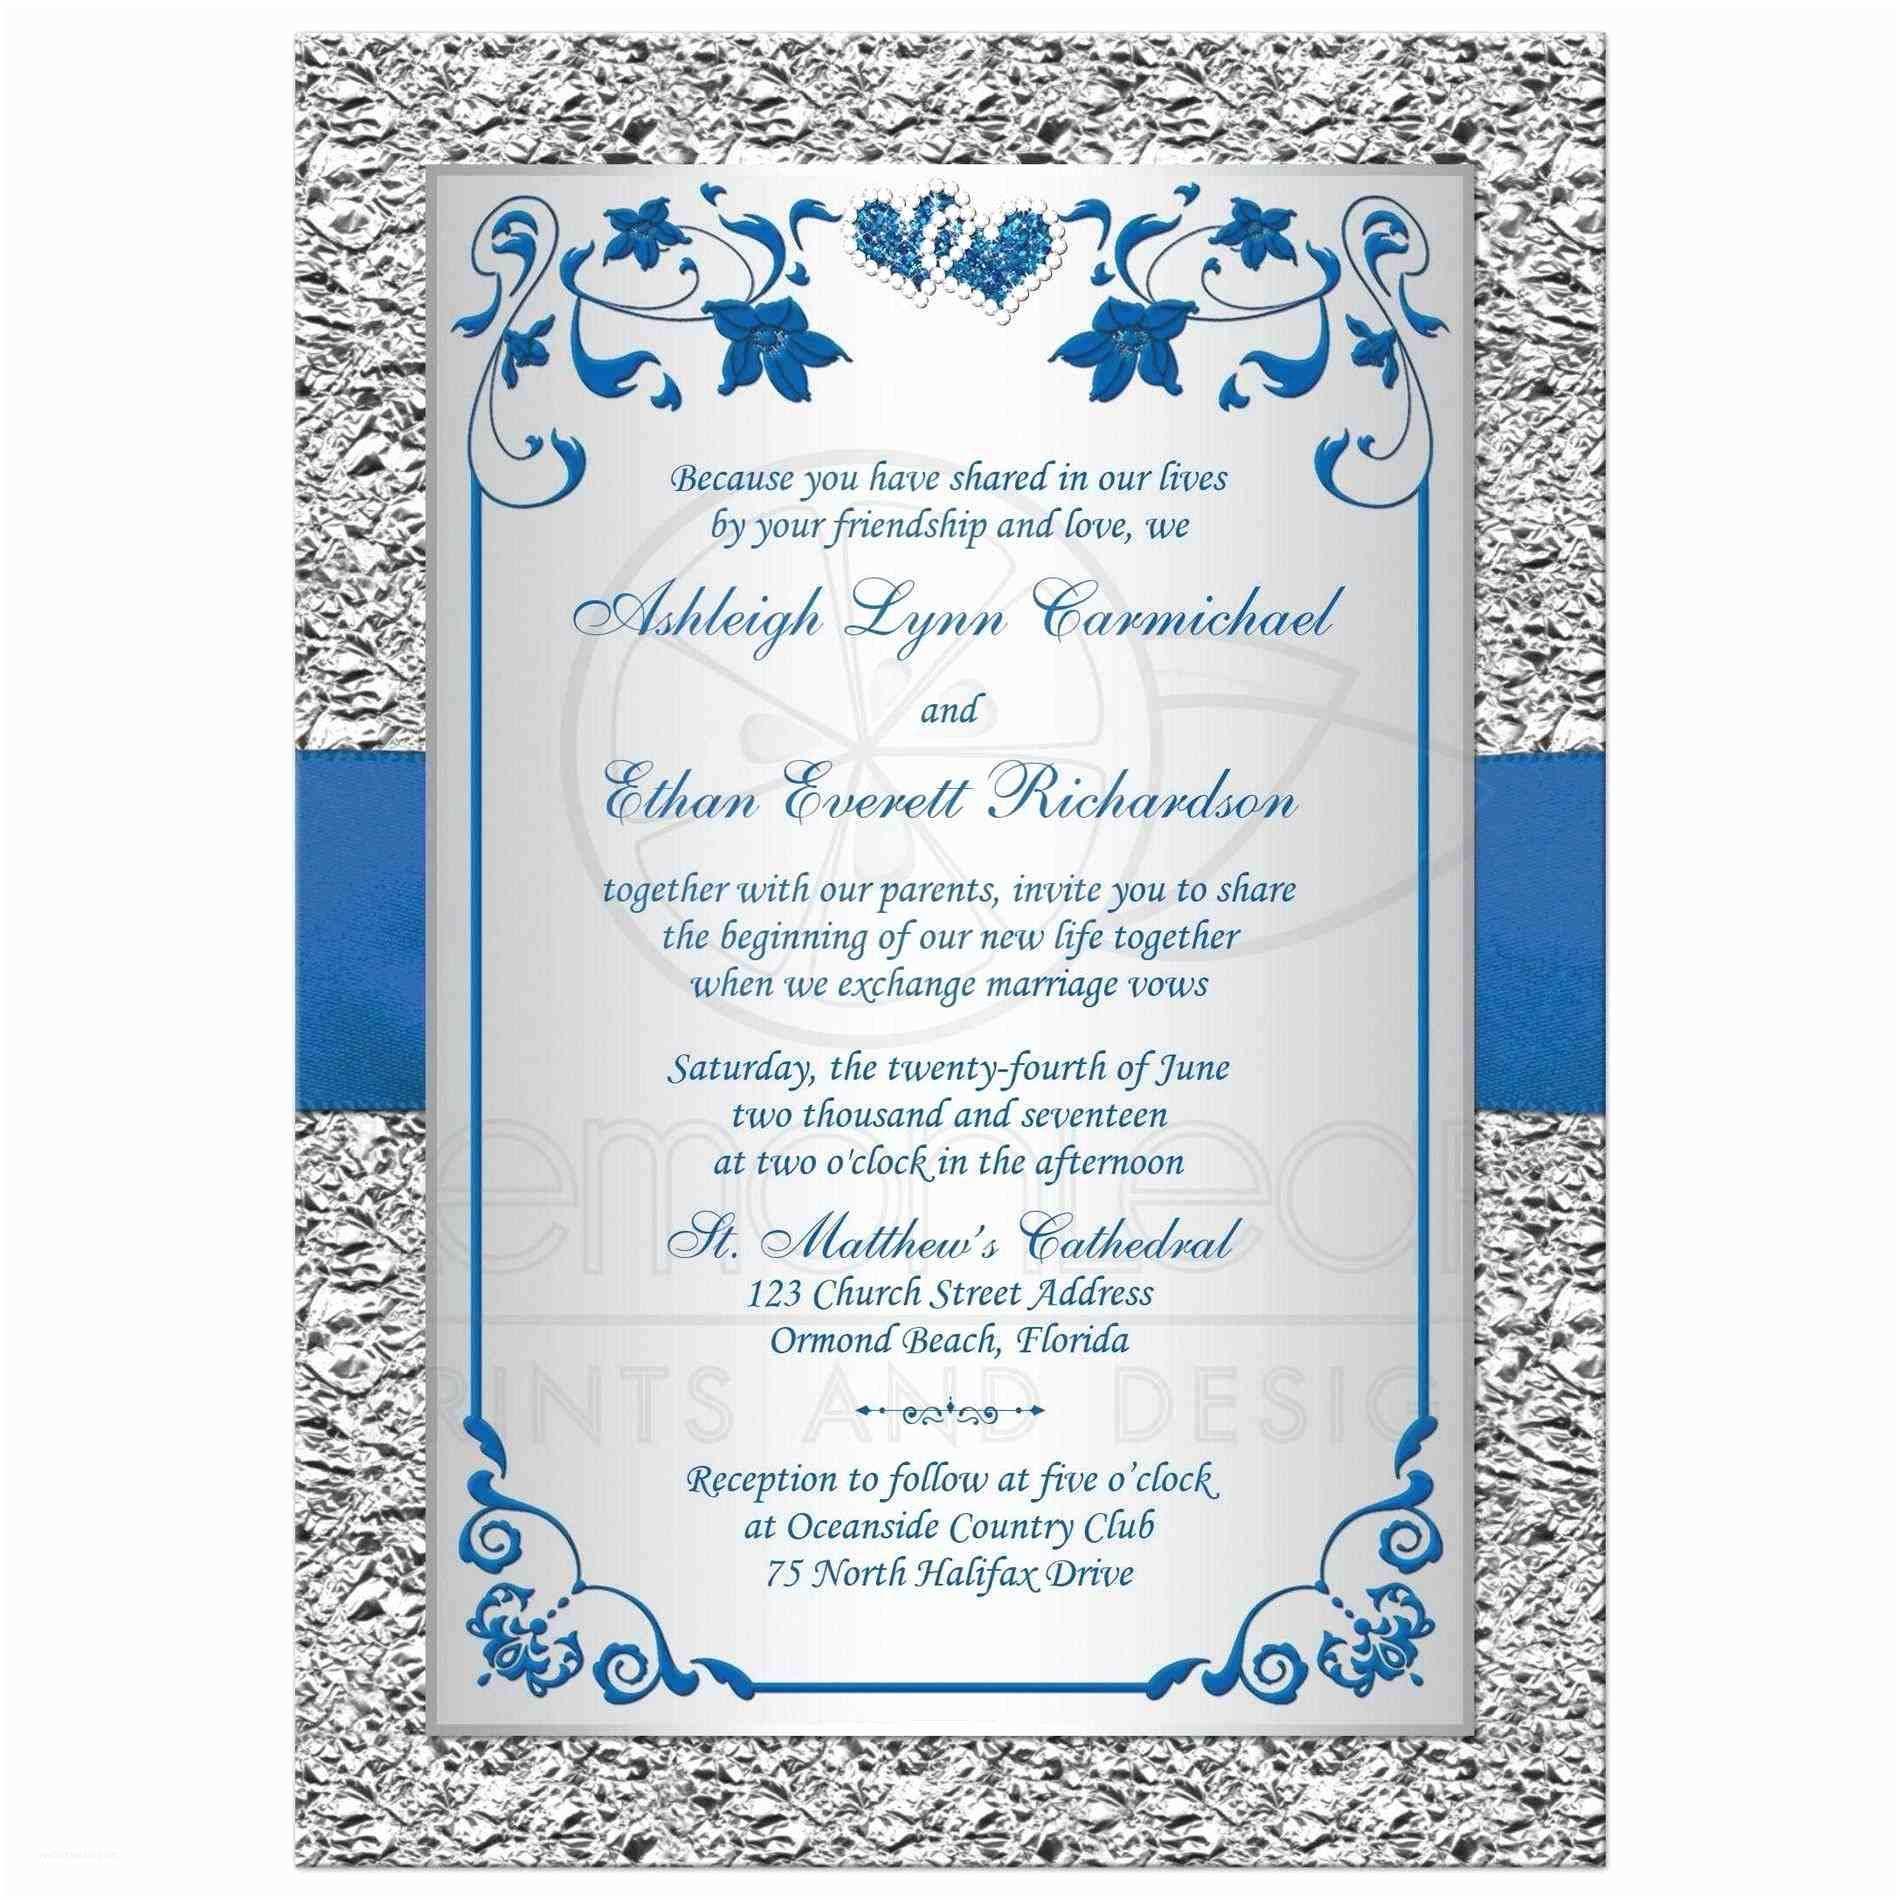 Silver Wedding Invitations Royal Blue and Silver Wedding Invitations